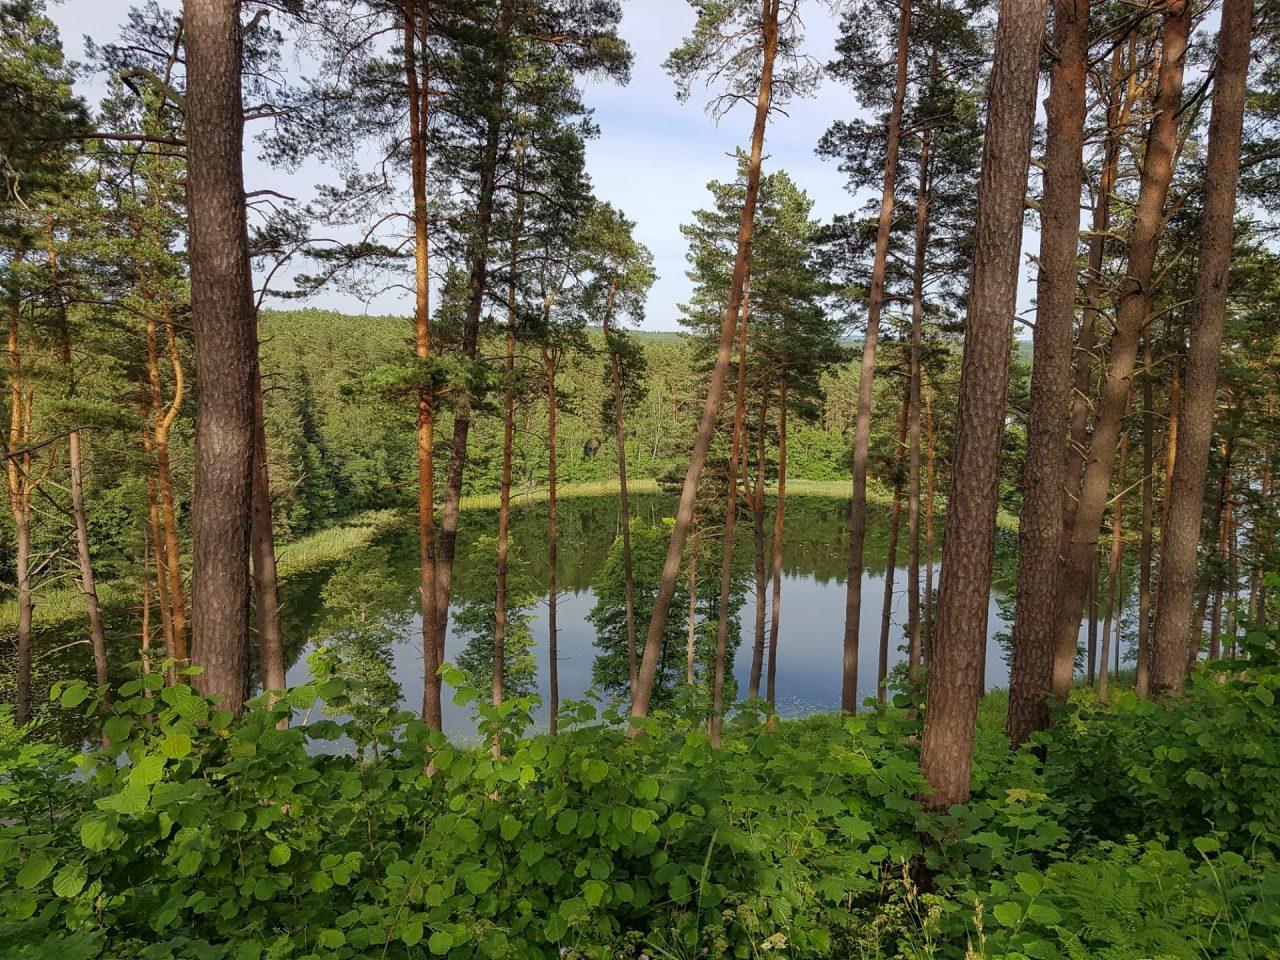 lituanie-parc-national-aukstaitija-lac-foret